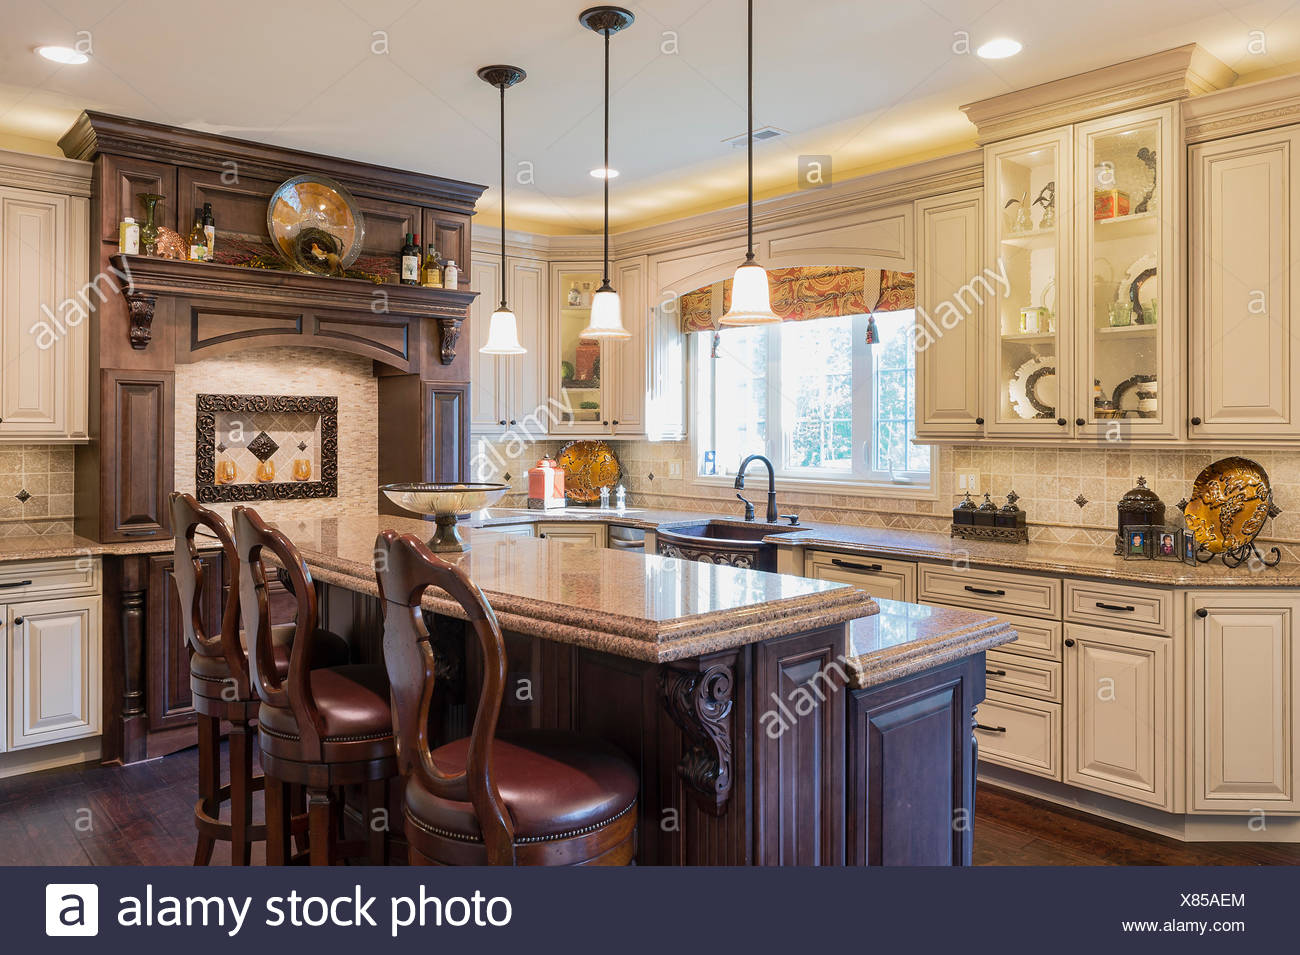 Cucine Di Lusso Design : Cucina di lusso interior design foto immagine stock